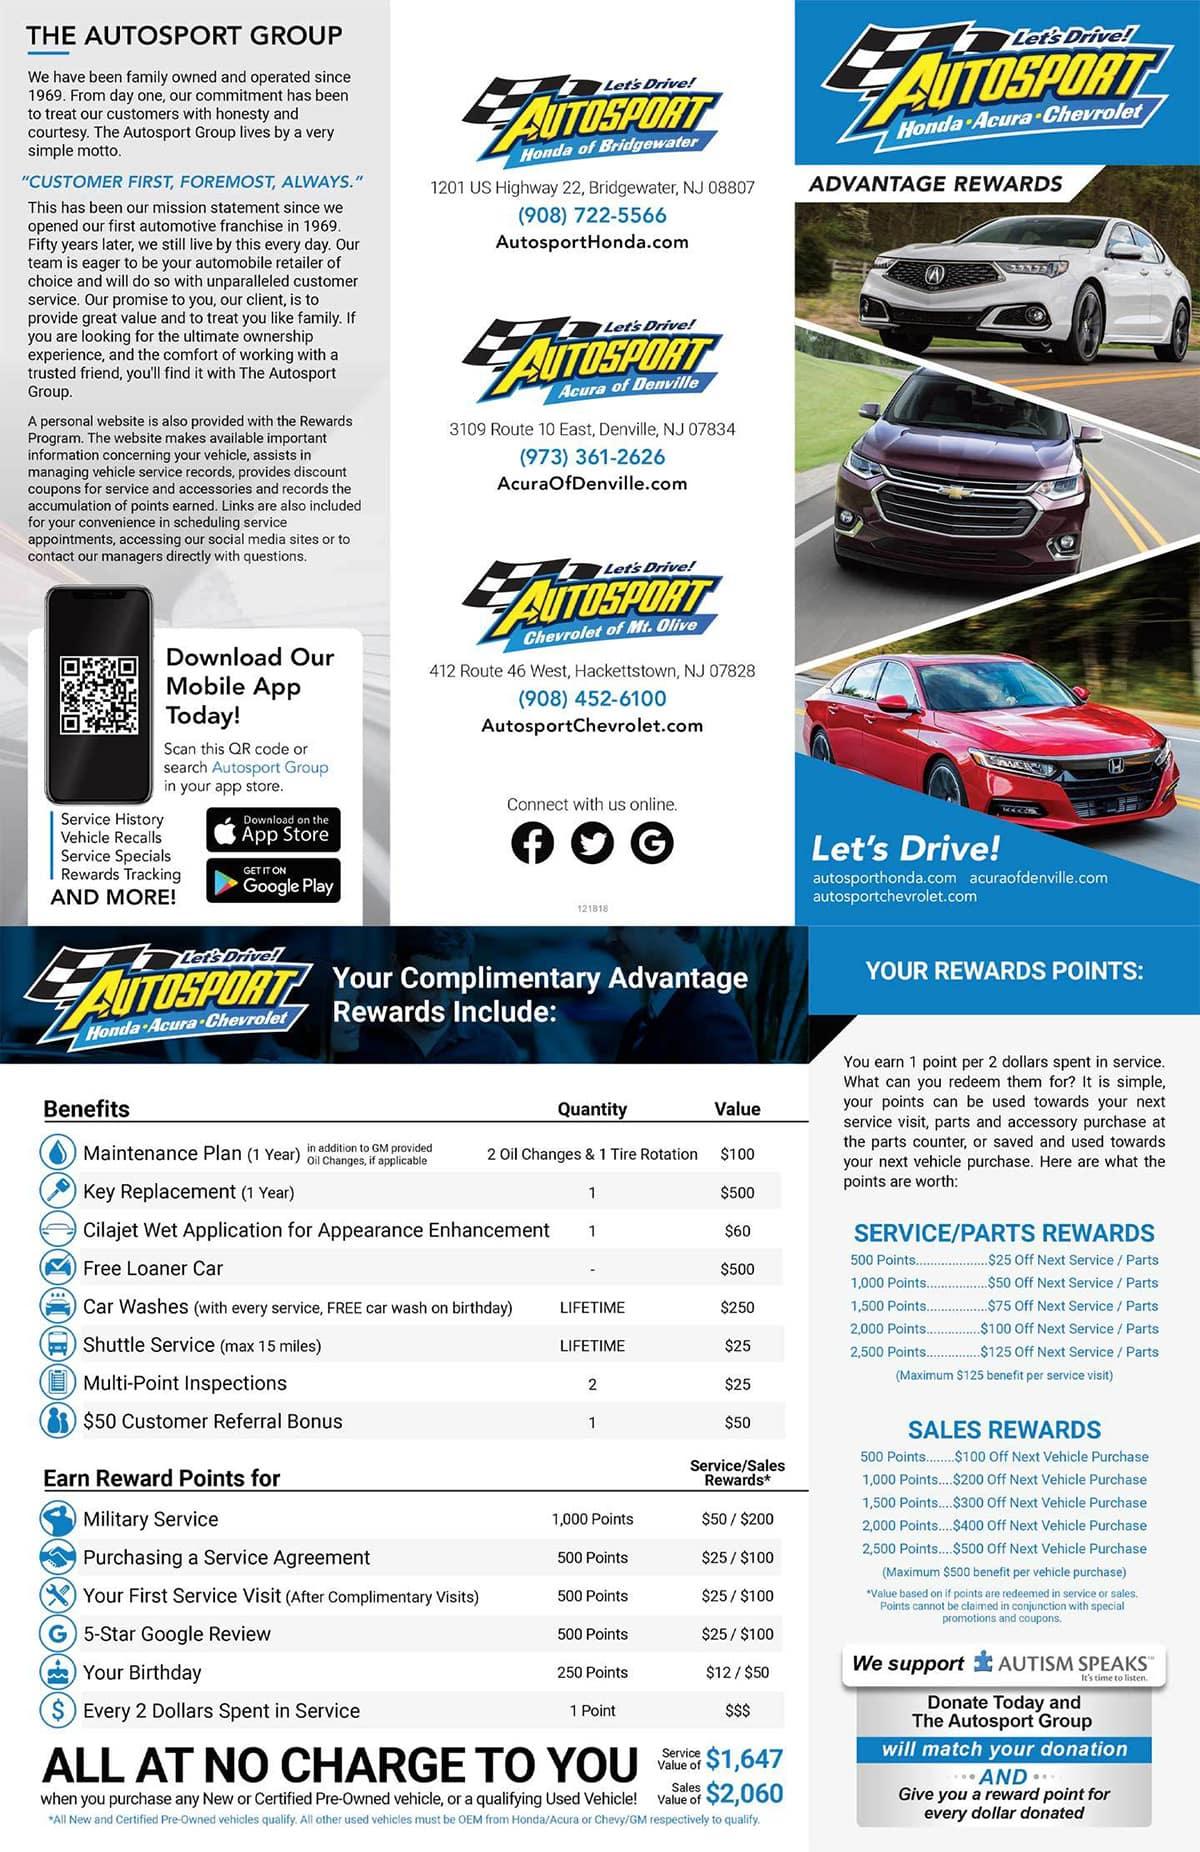 autosport advantage image